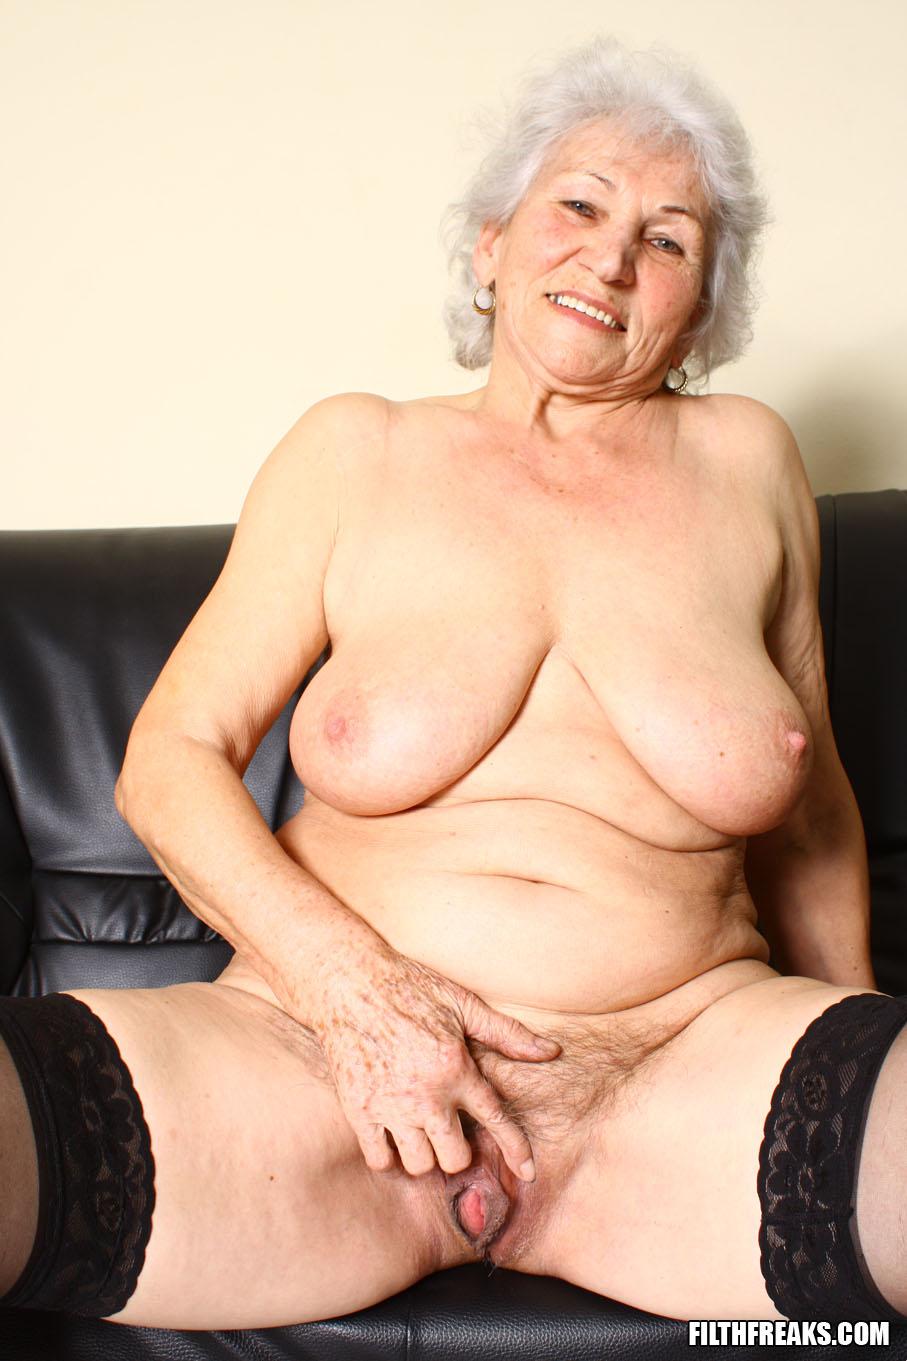 filthfreaks granny Black